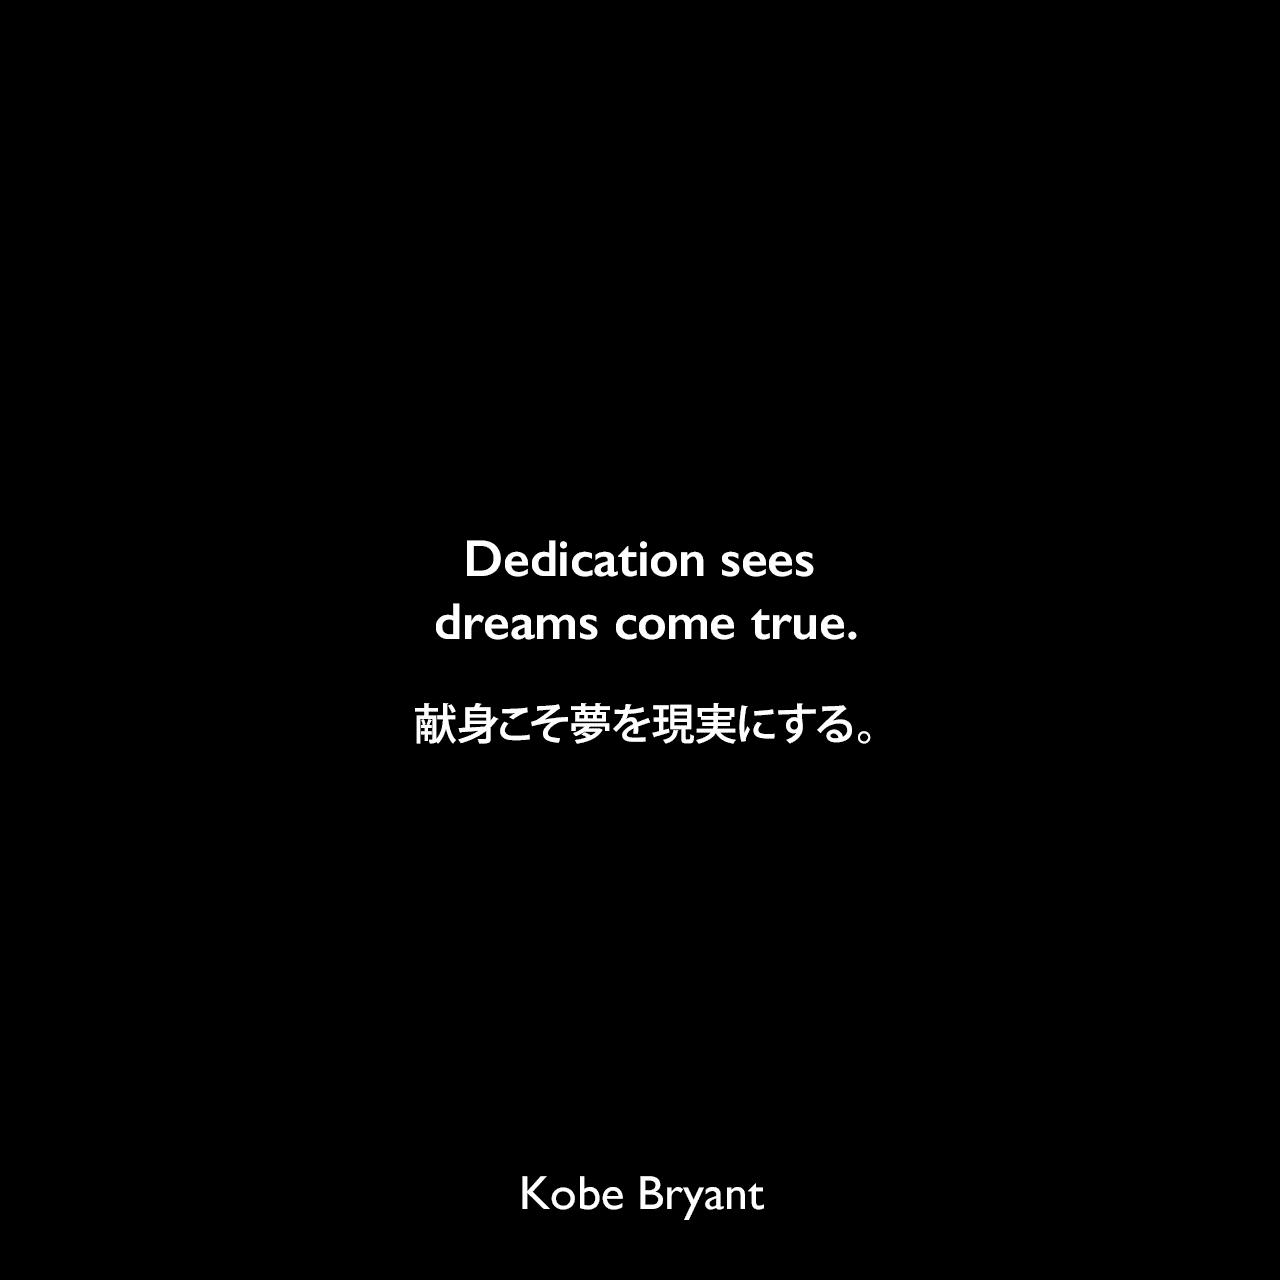 Dedication sees dreams come true.献身こそ夢を現実にする。